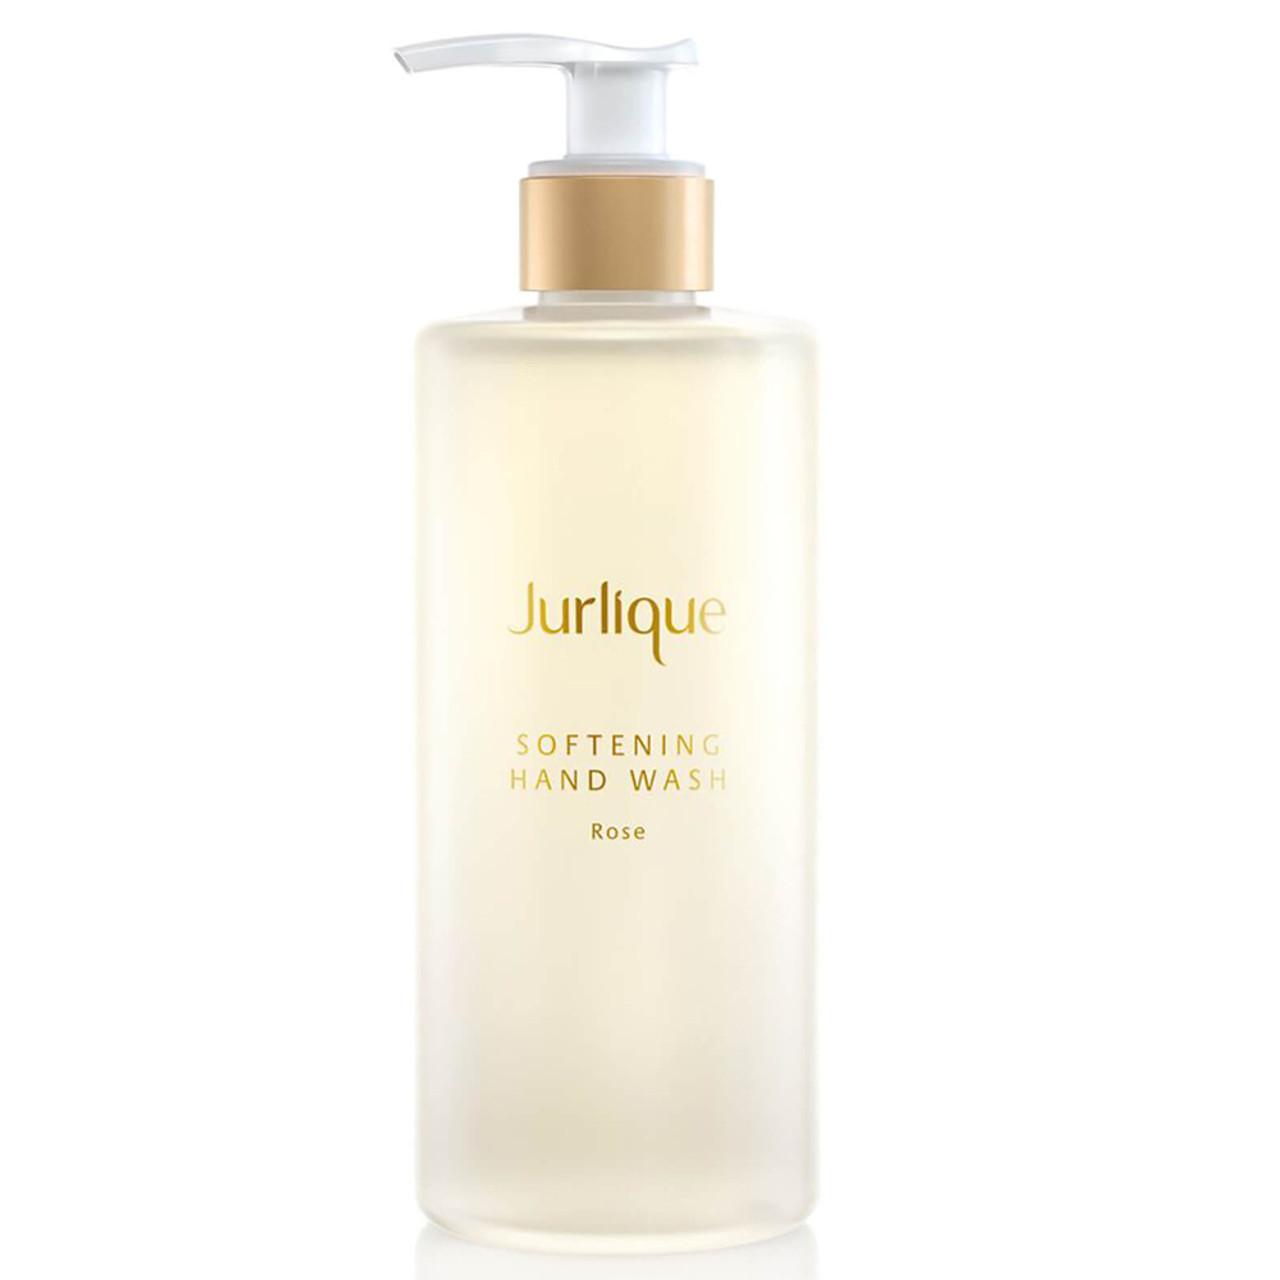 Jurlique Softening Rose Hand Wash